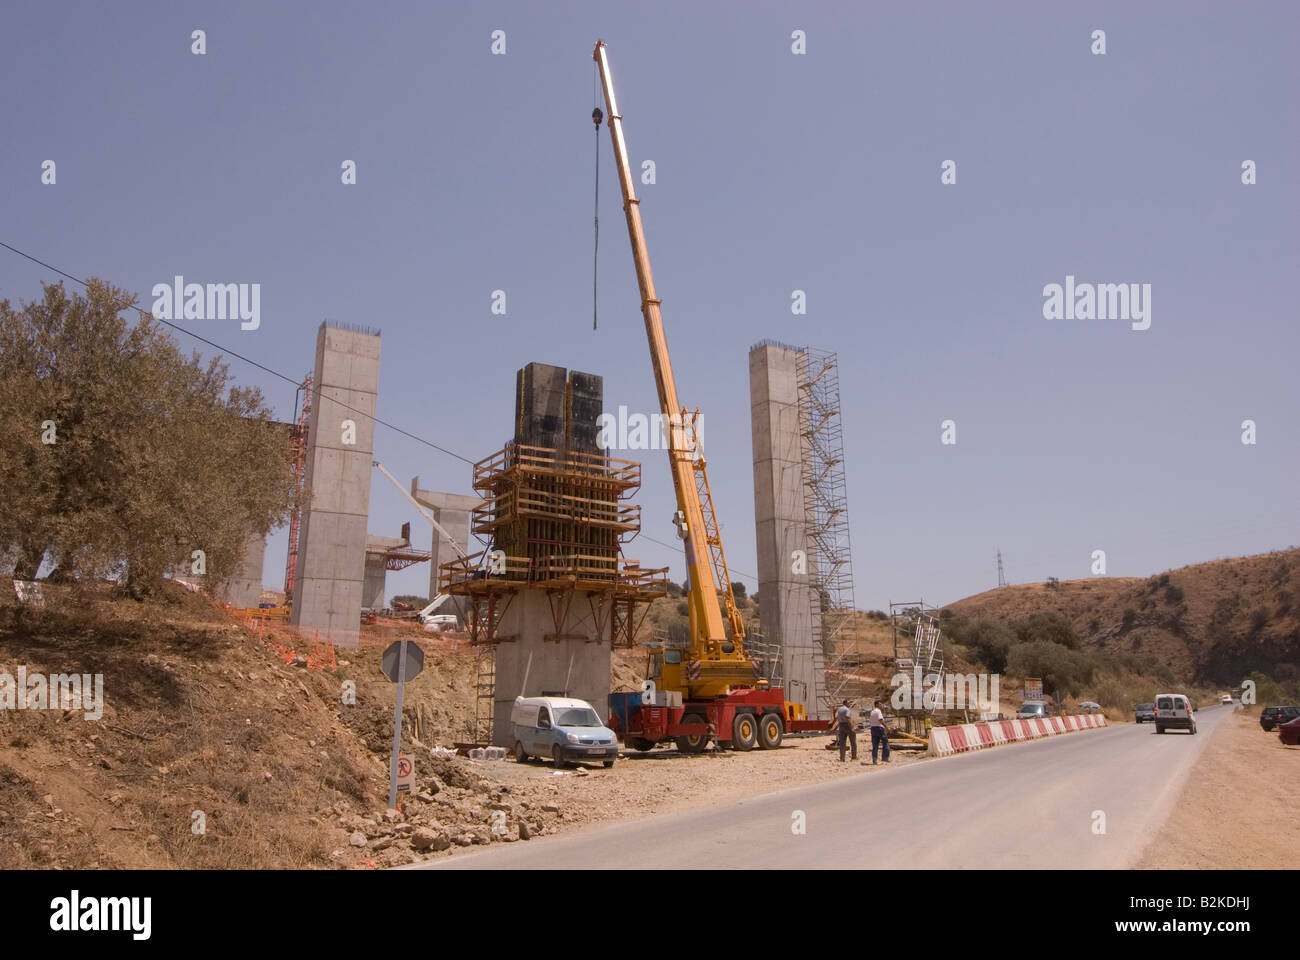 Building the new AP 46 motorway near Casabermeja, Andalucia, Spain - Stock Image